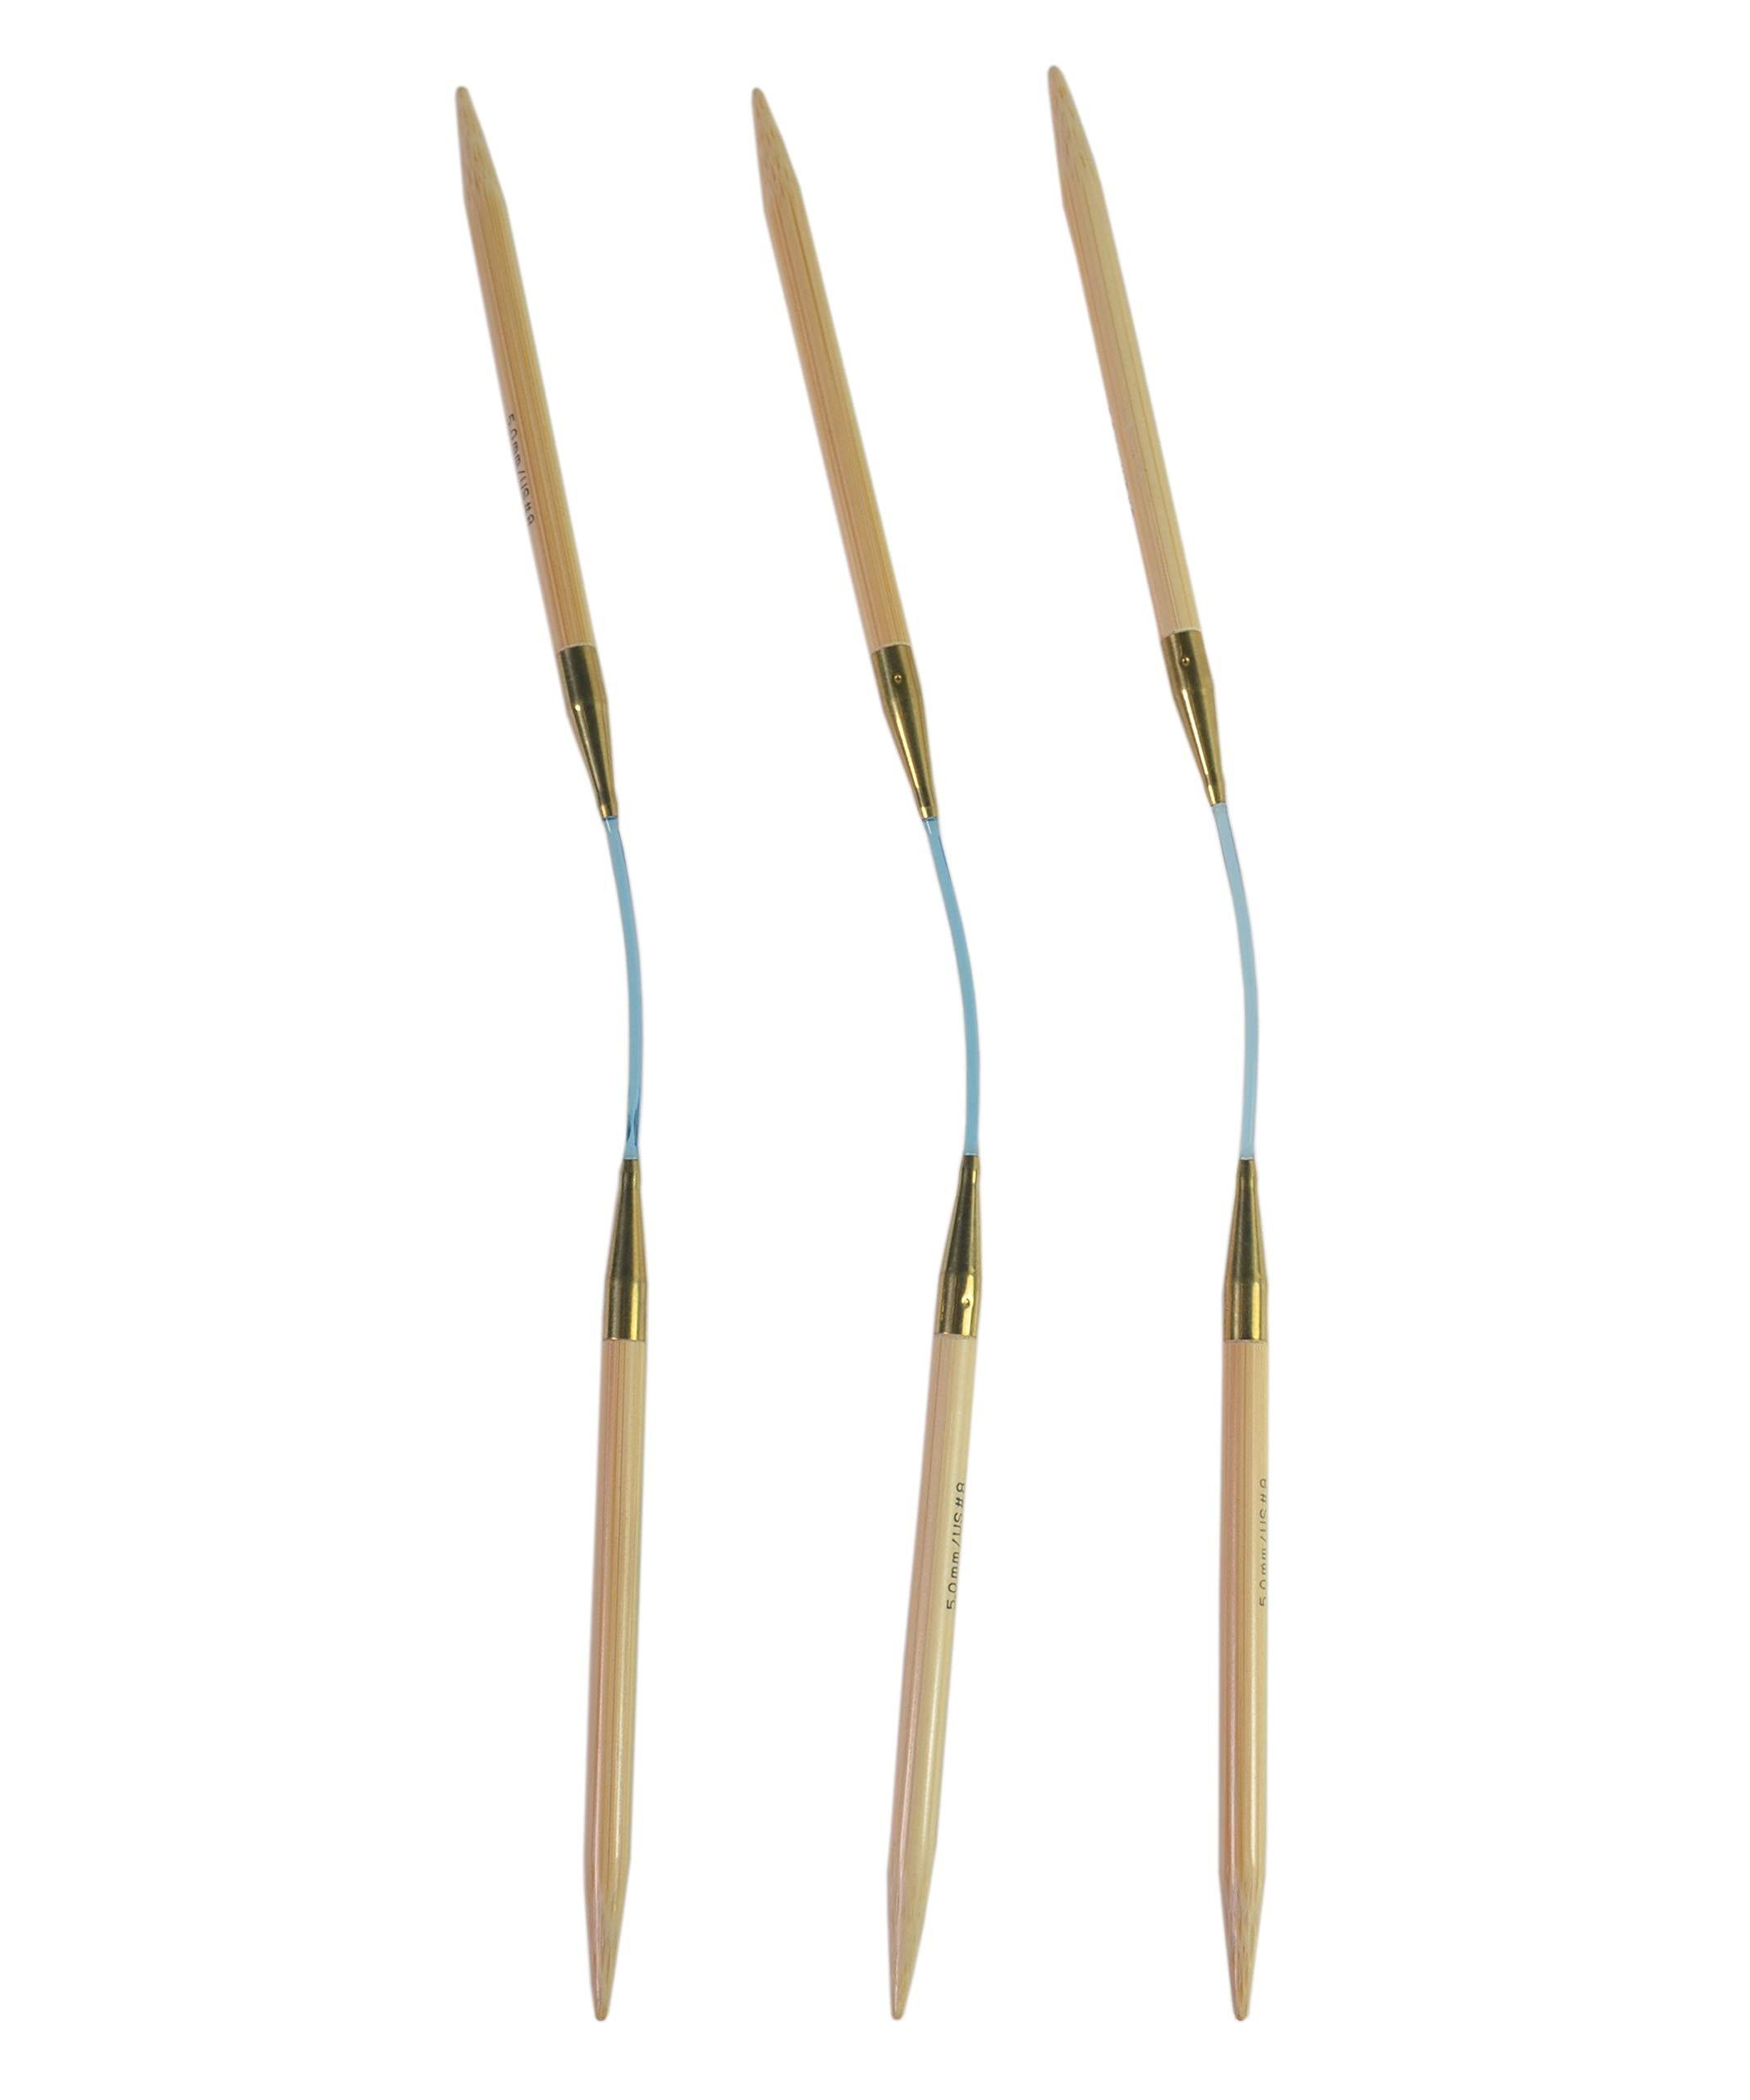 addi Flexi Flip Bamboo Knitting Needles (Set of 3) - US 7 (4.5mm)